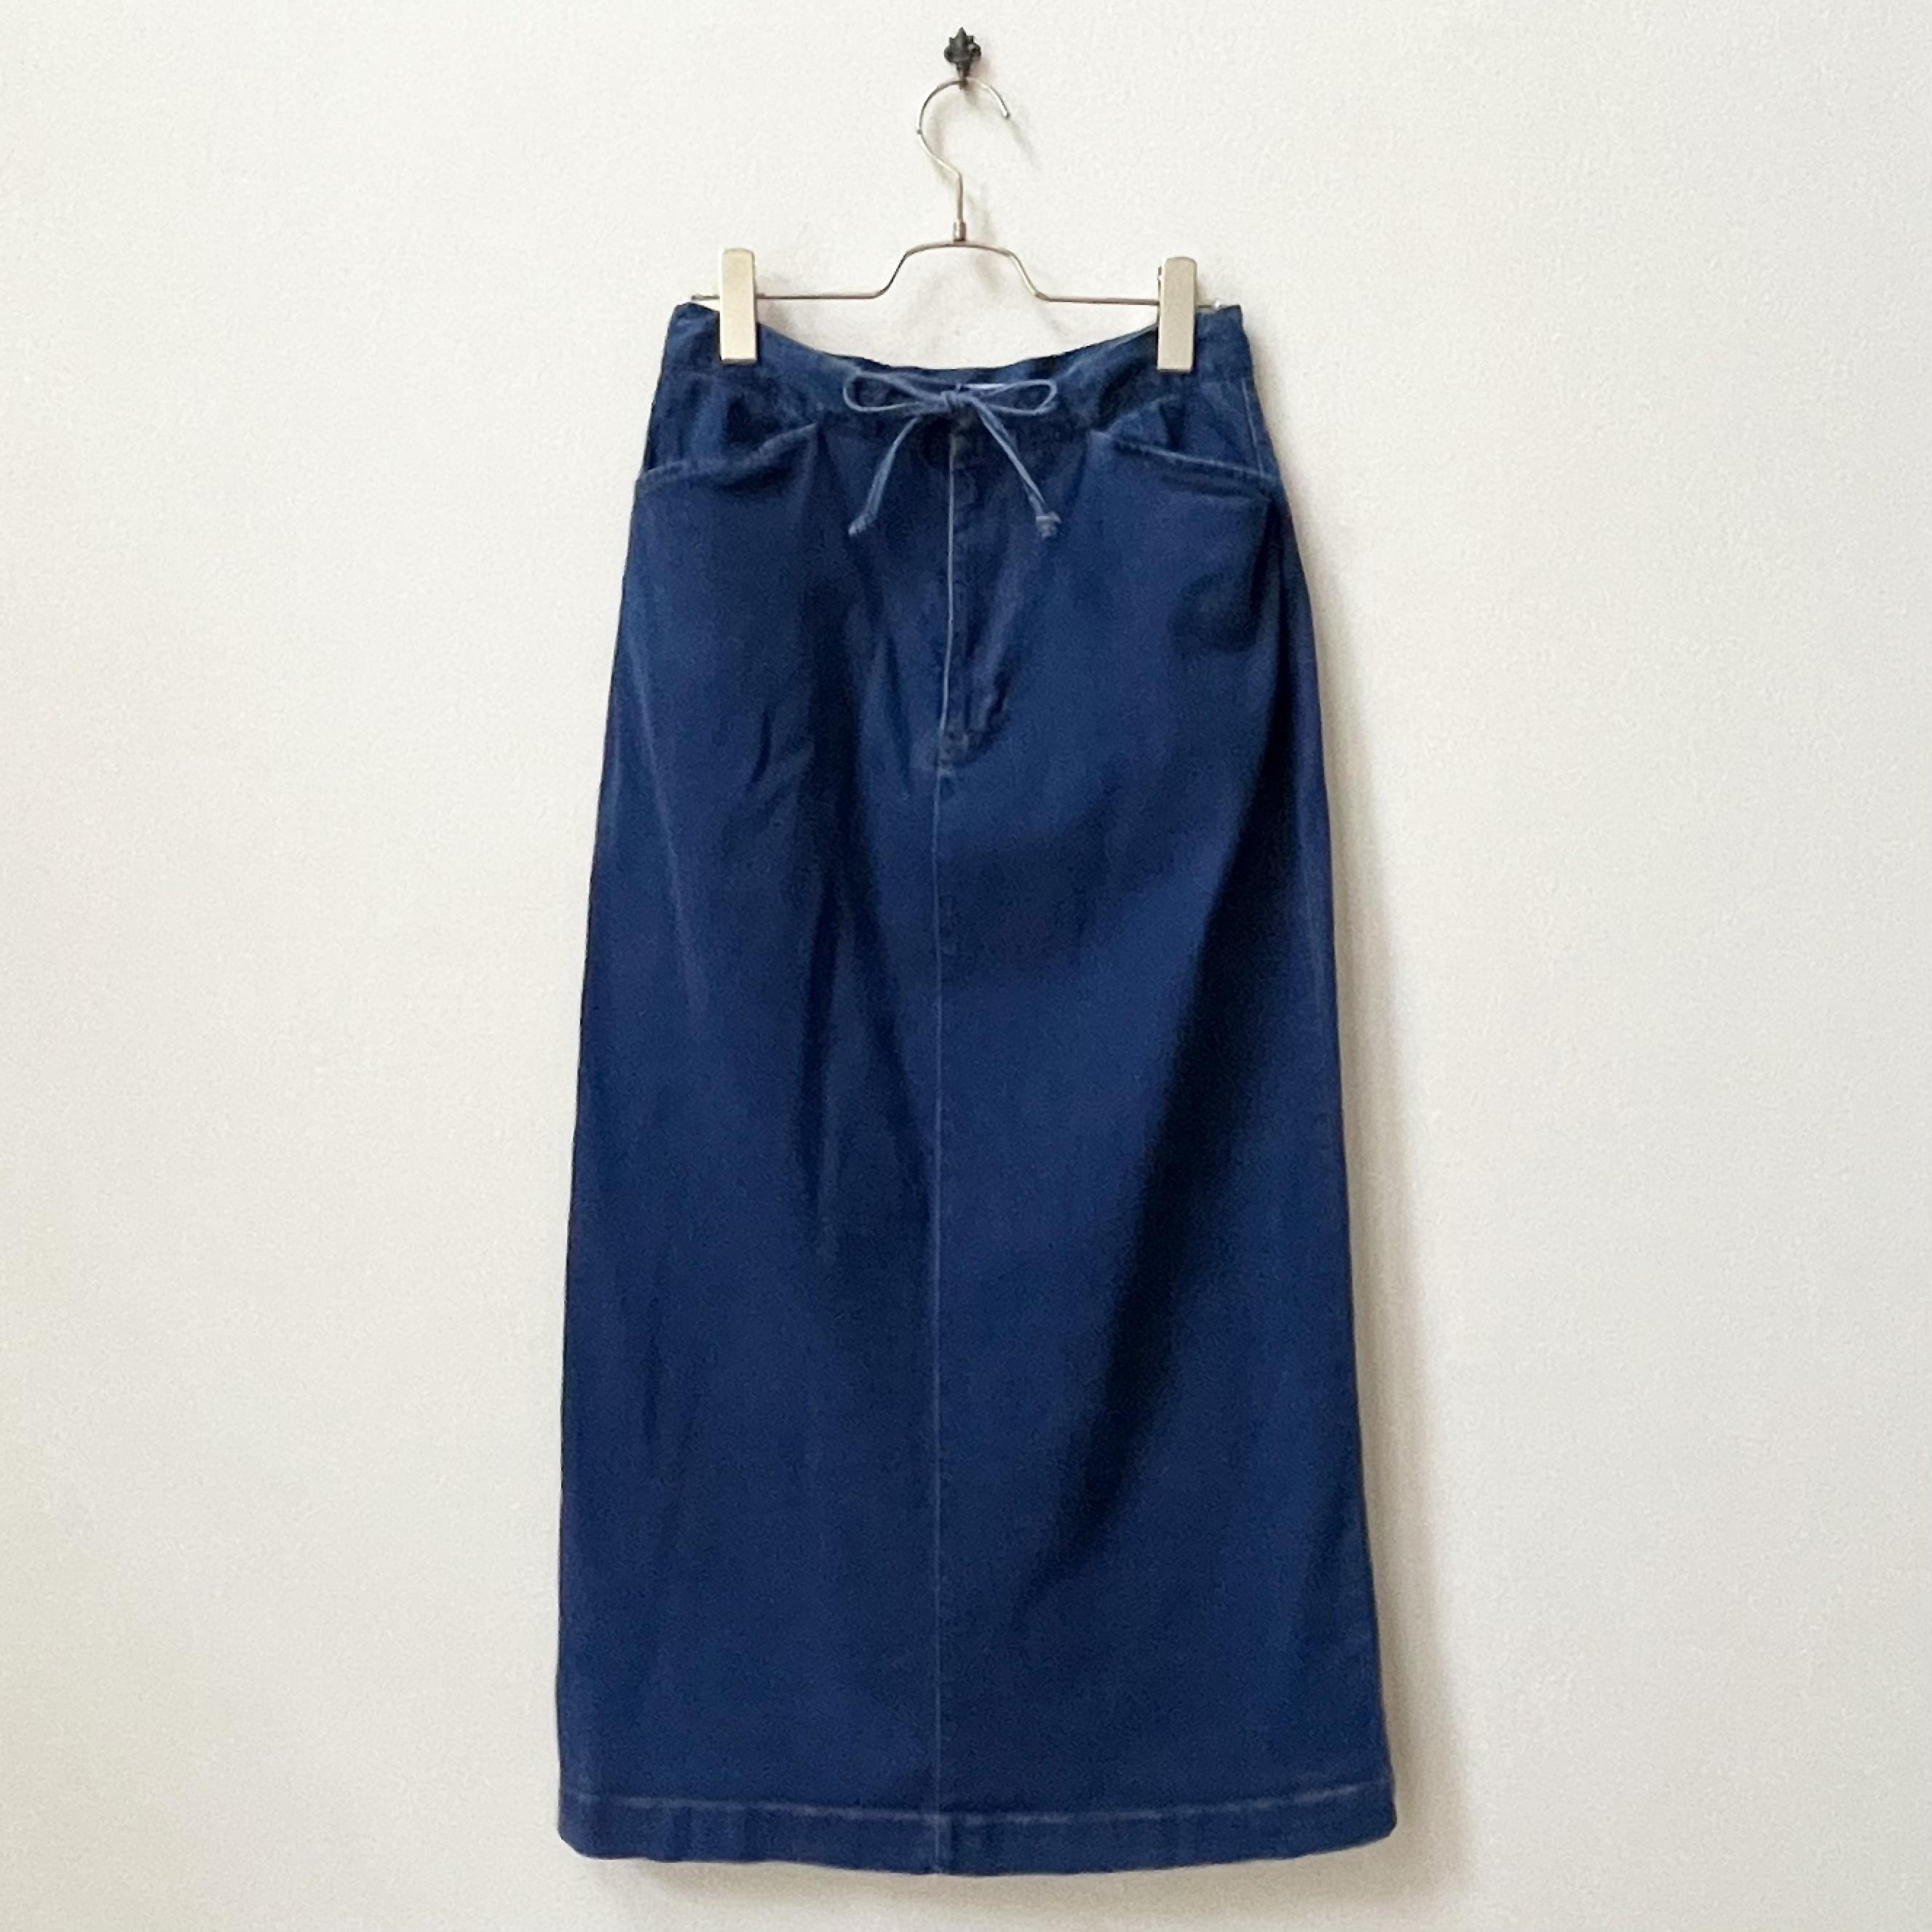 CHEROKEE 90年代 ウエストリボン デニムロングスカート アメリカ 古着 日本L〜LL